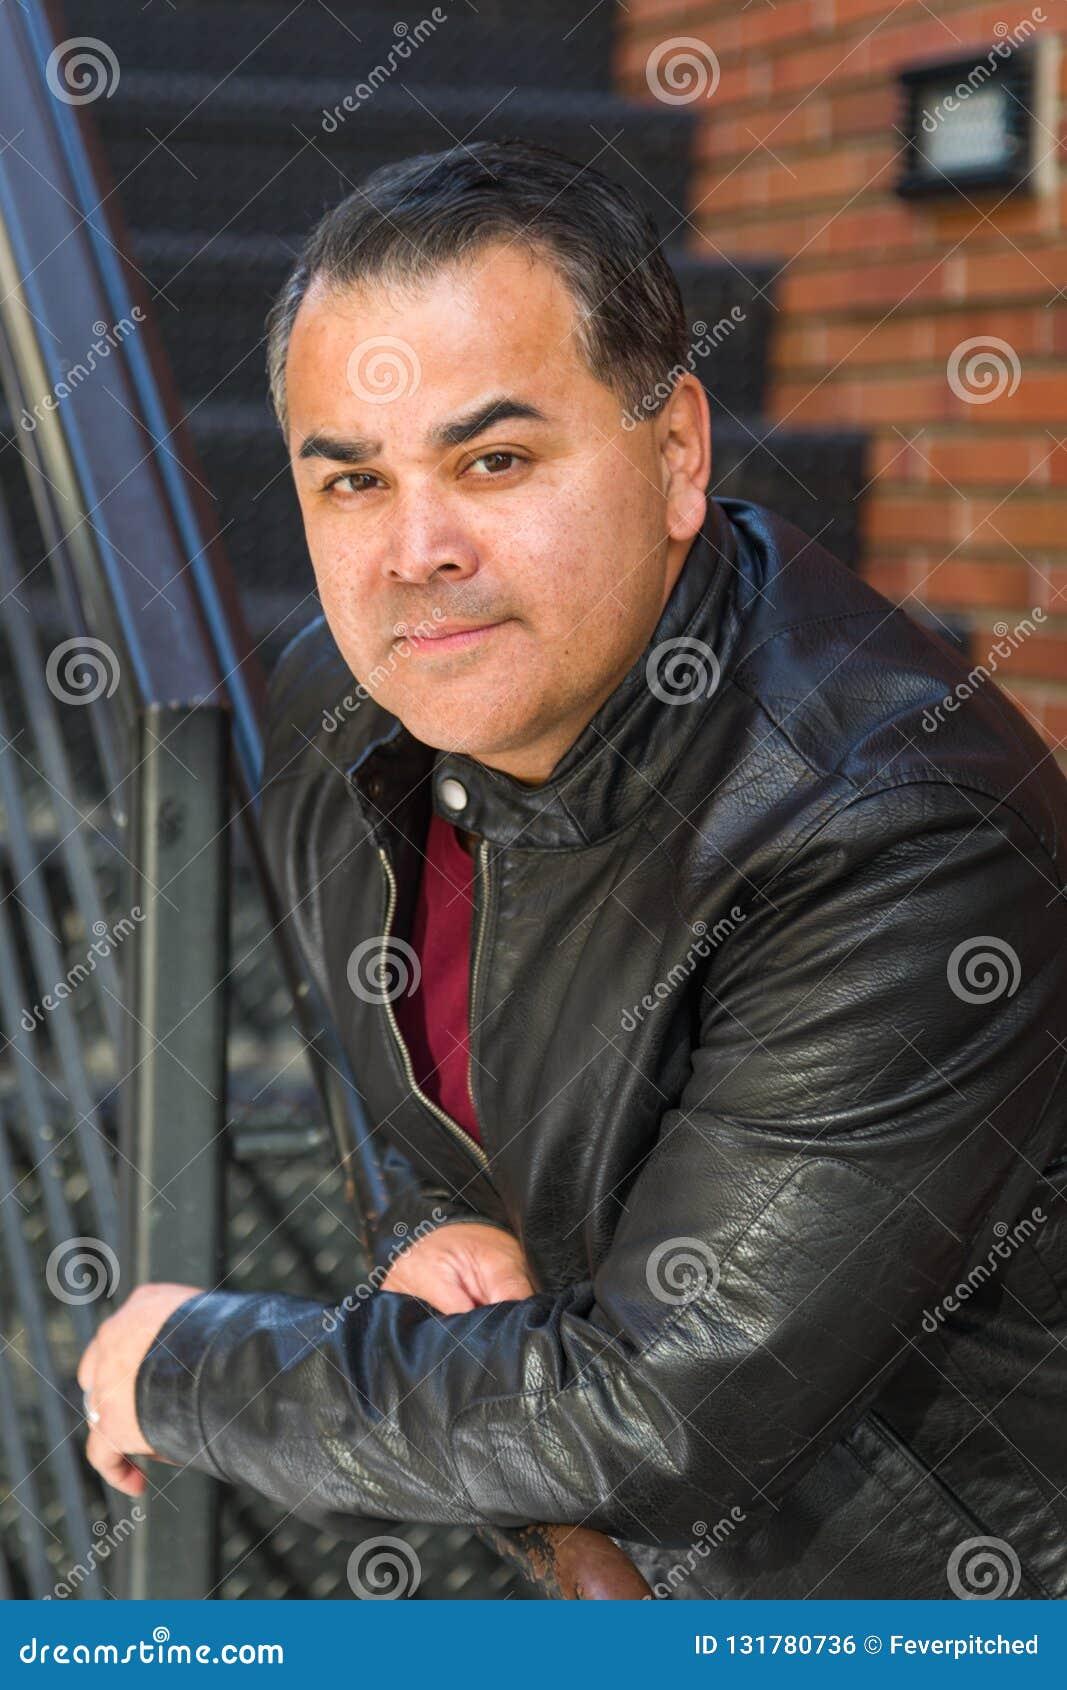 Headshot Portrait of Handsome Hispanic Man